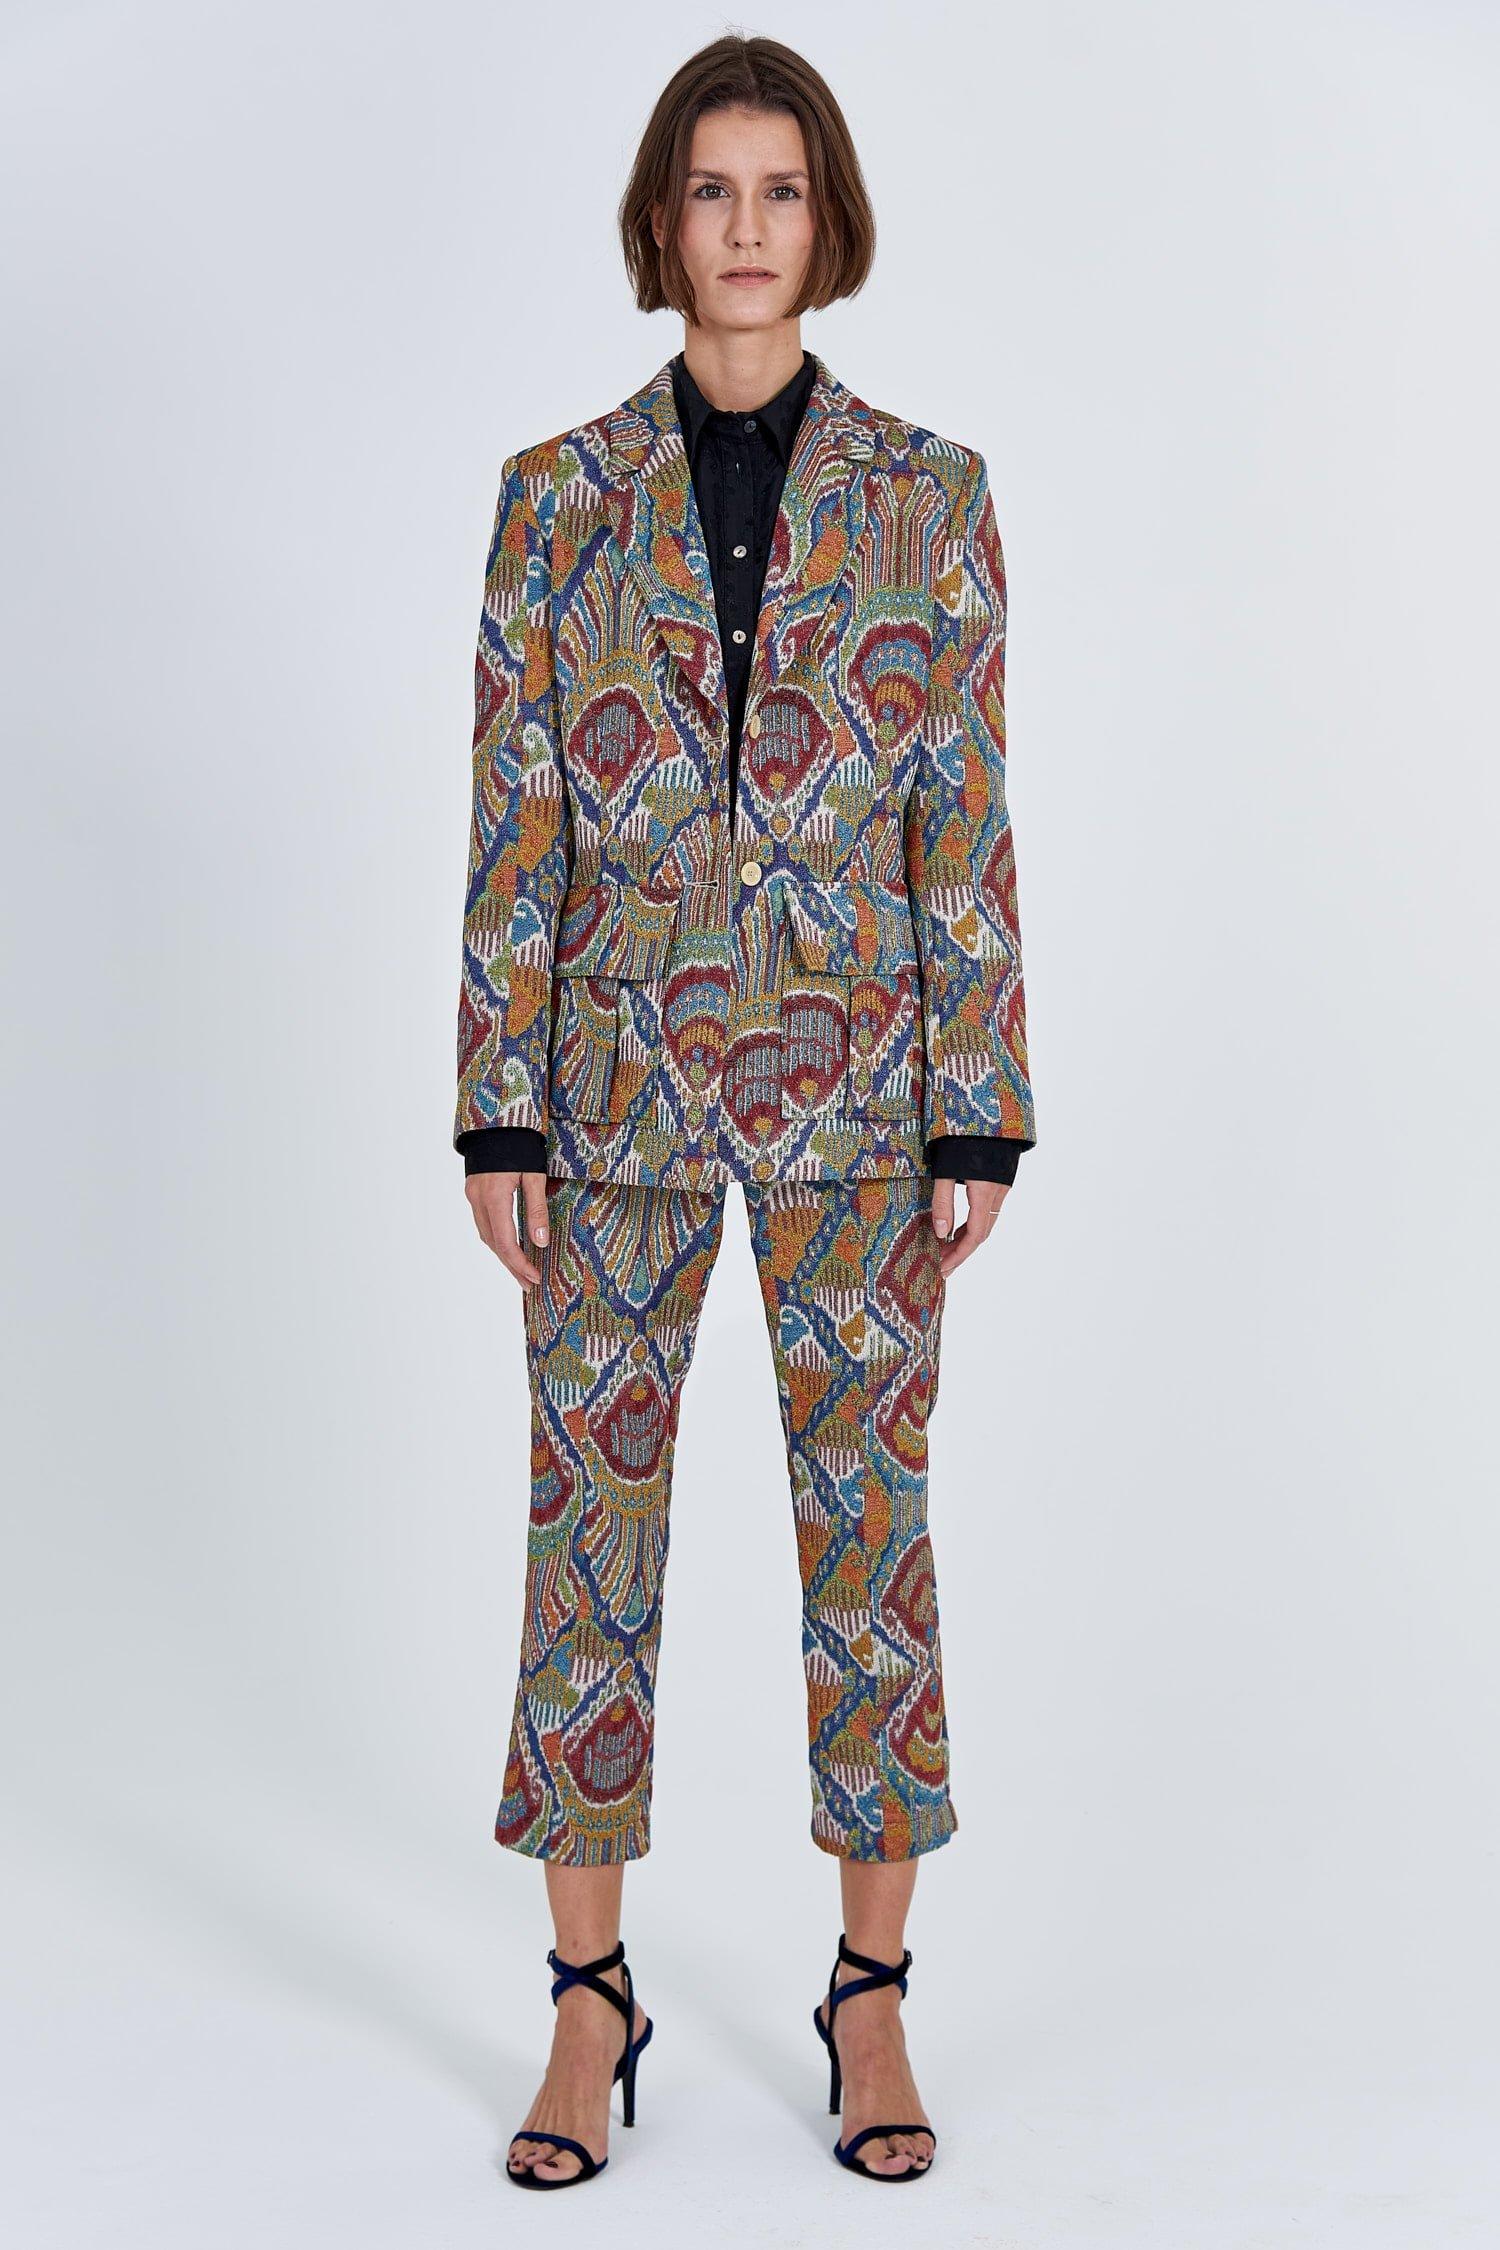 Acephala Fw 2020 21 Jacquard Suit Jacket Front